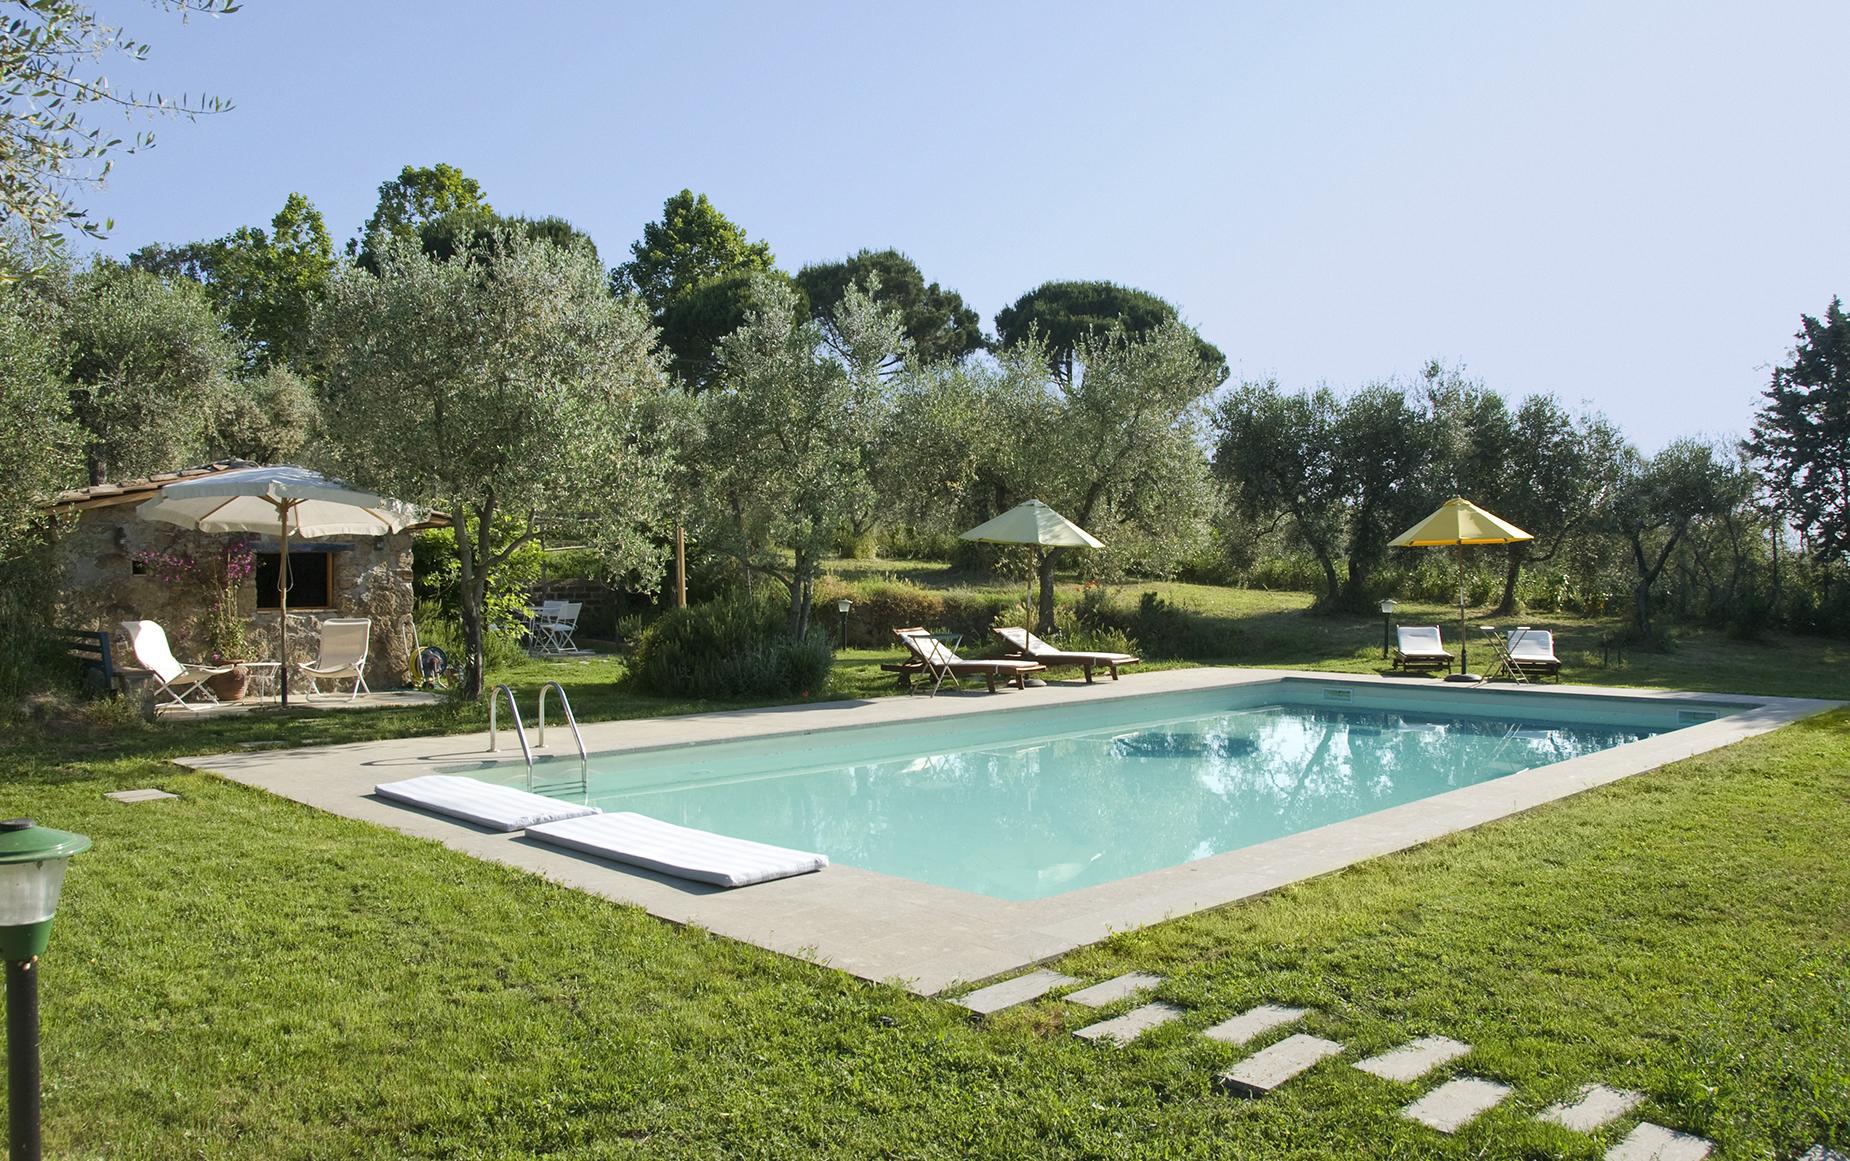 piscina_13405